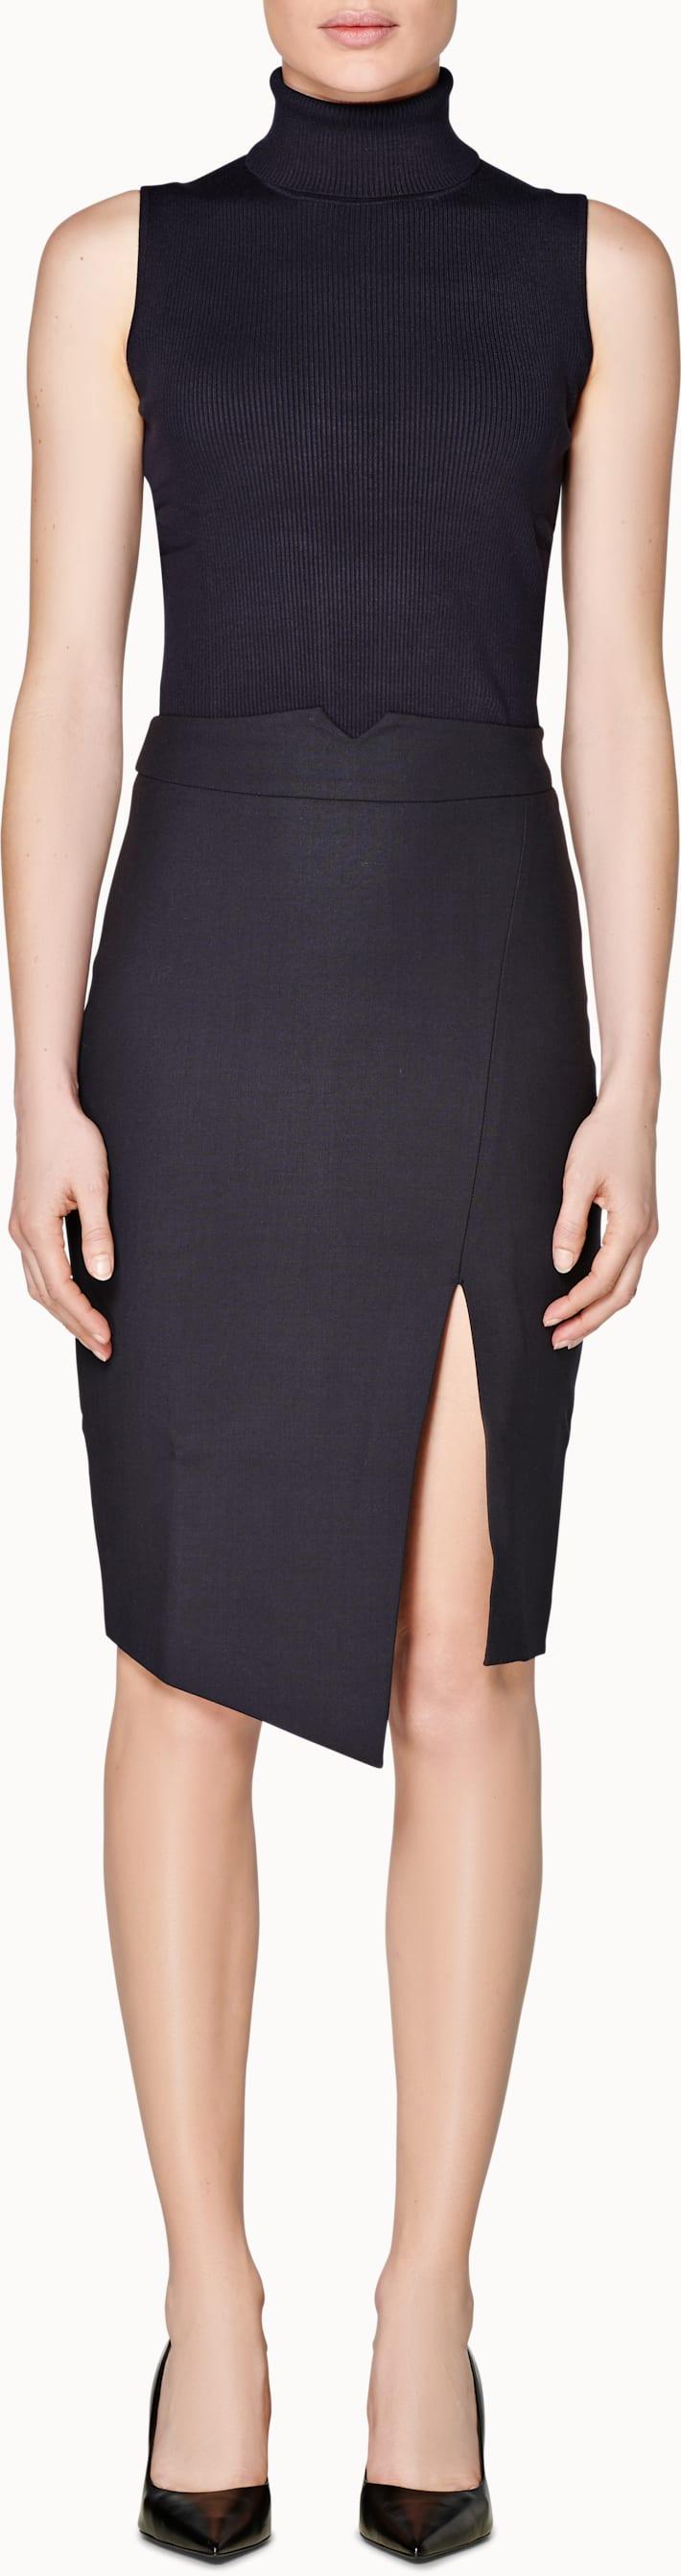 Addison Navy  Skirt